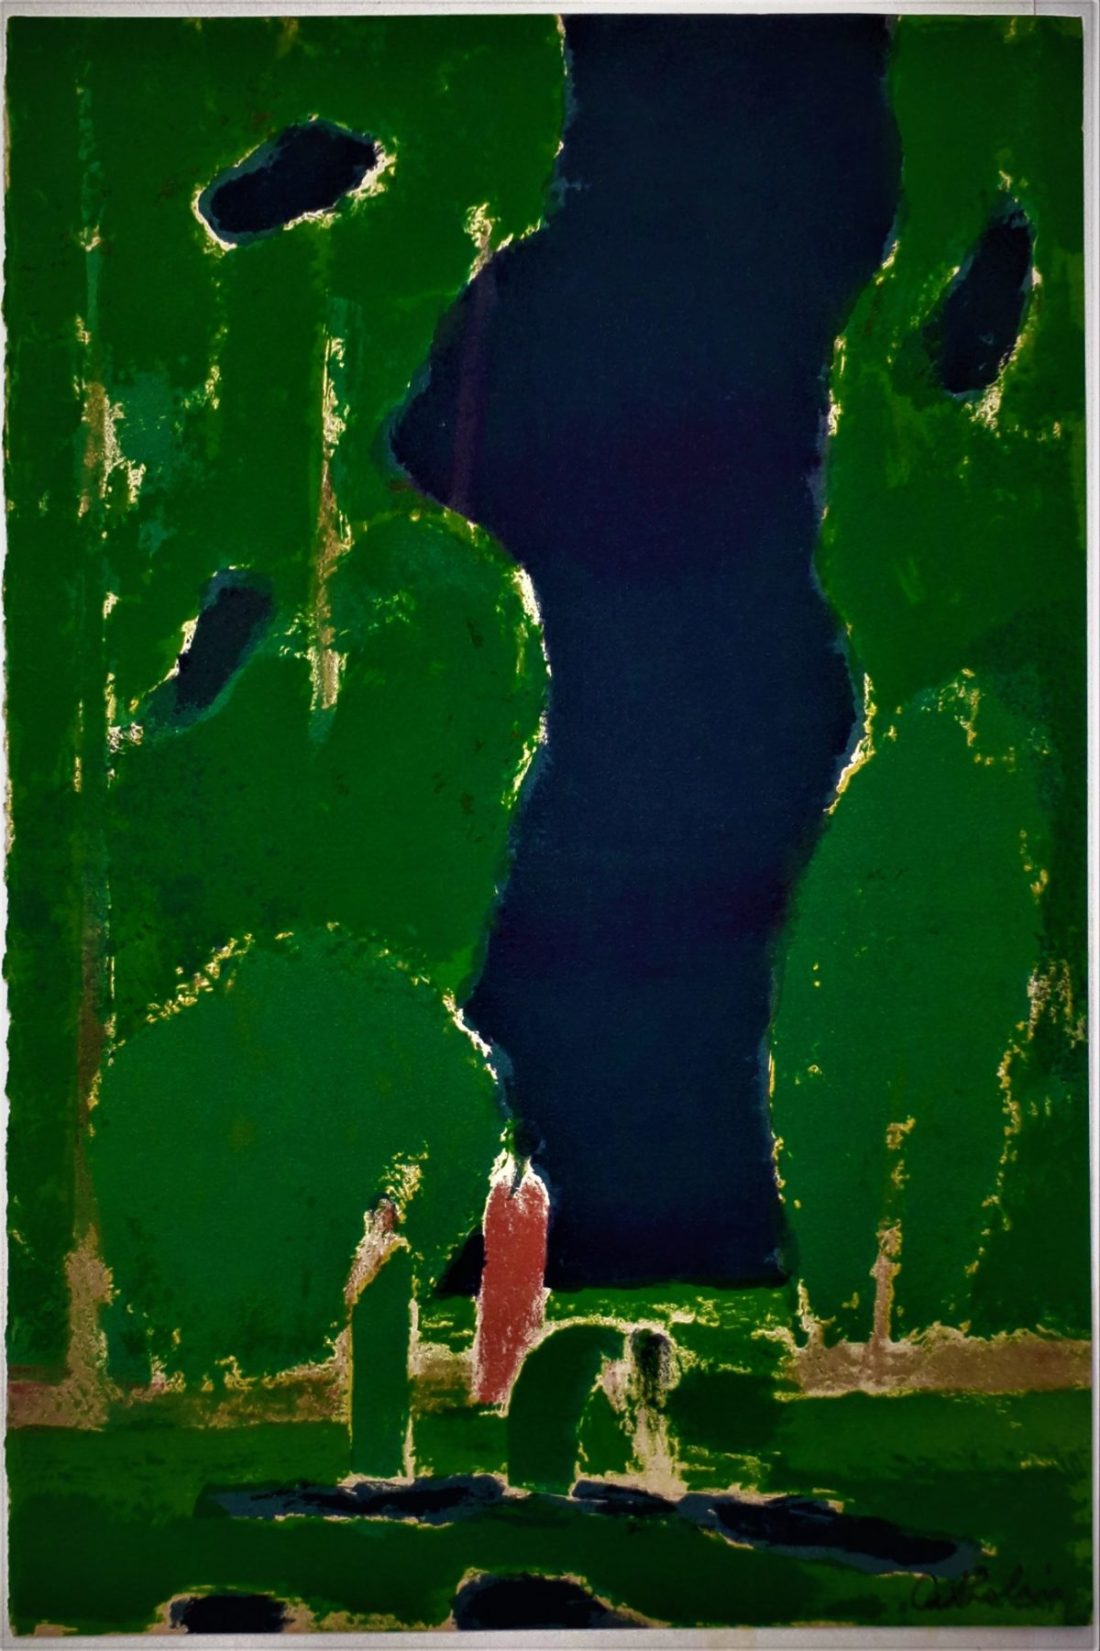 cathelin-bernard-clairiere-a-ceylan-1972-lithographie